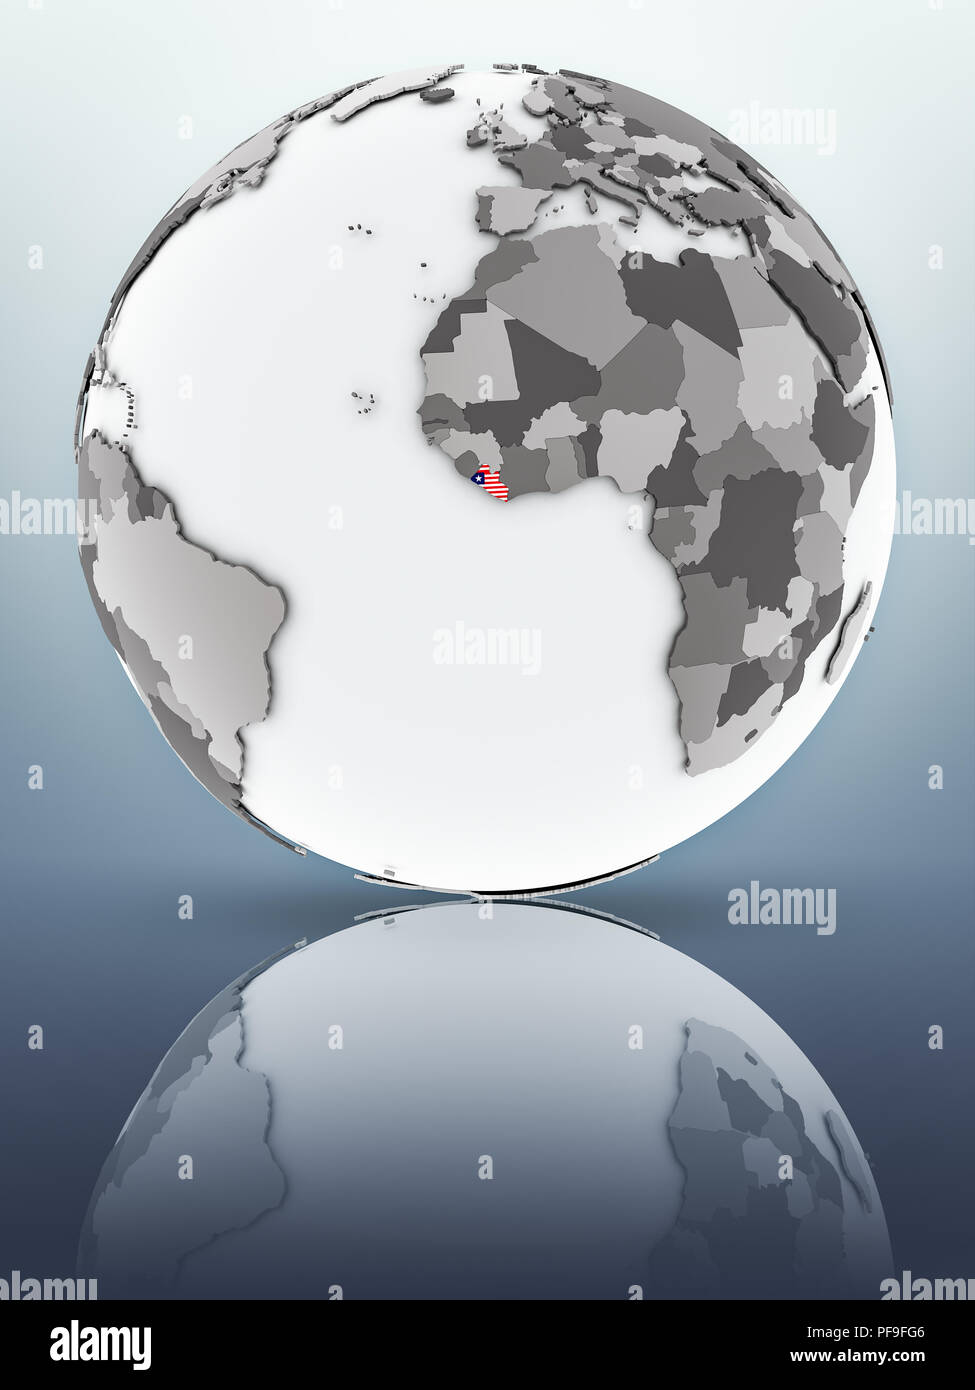 Liberia with flag on globe reflecting on surface. 3D illustration. - Stock Image